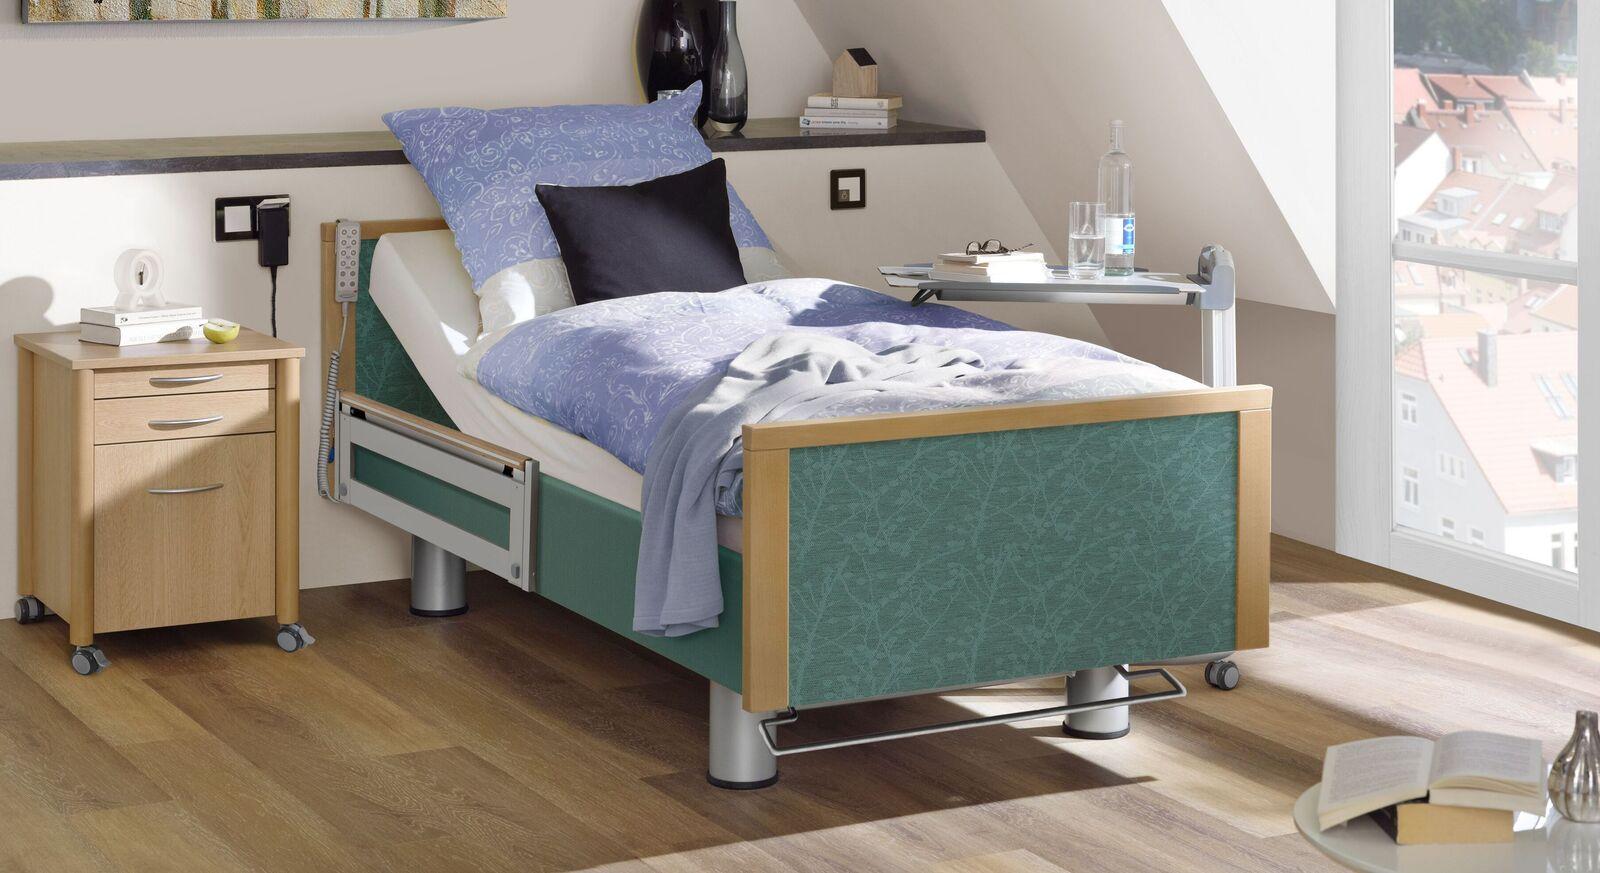 Komfortbett mit Pflegebett-Funktion Sylt mit petrolfarbenem Stoff